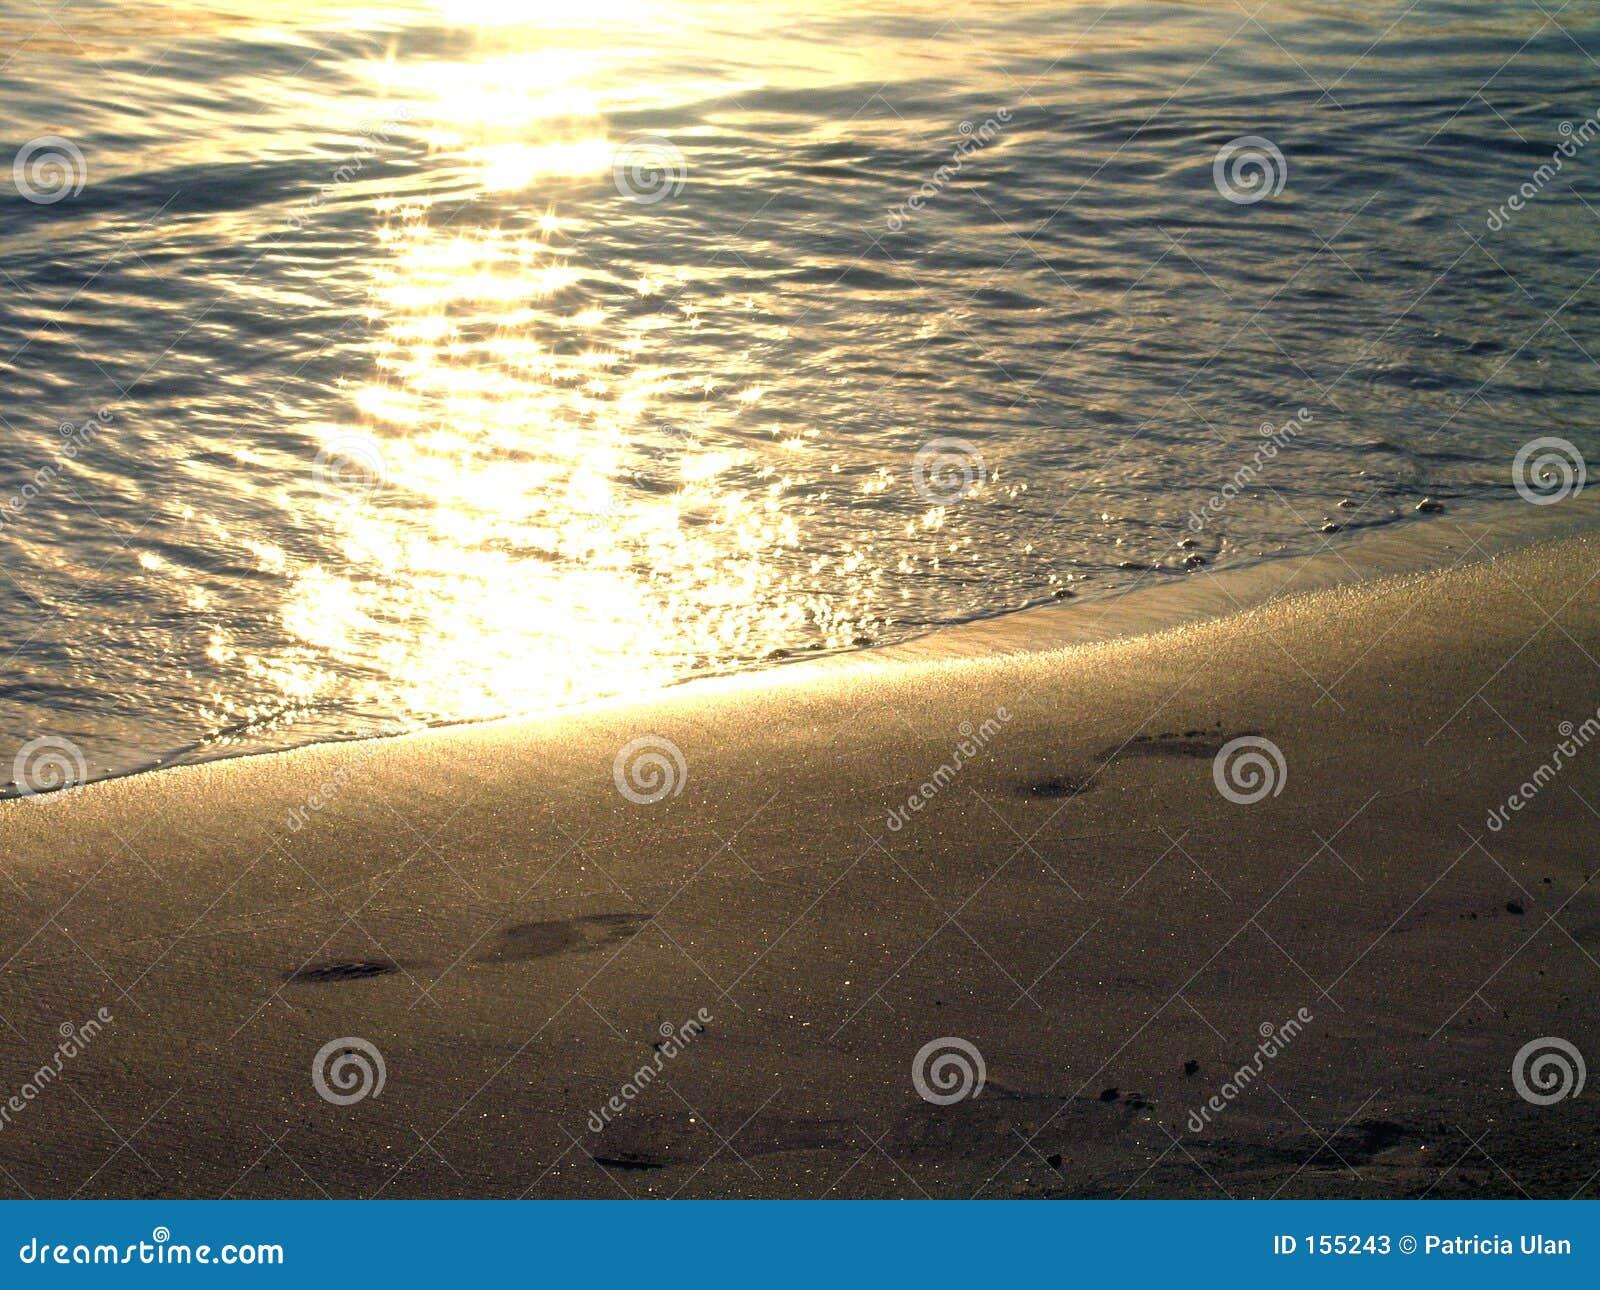 Footprints at sunset